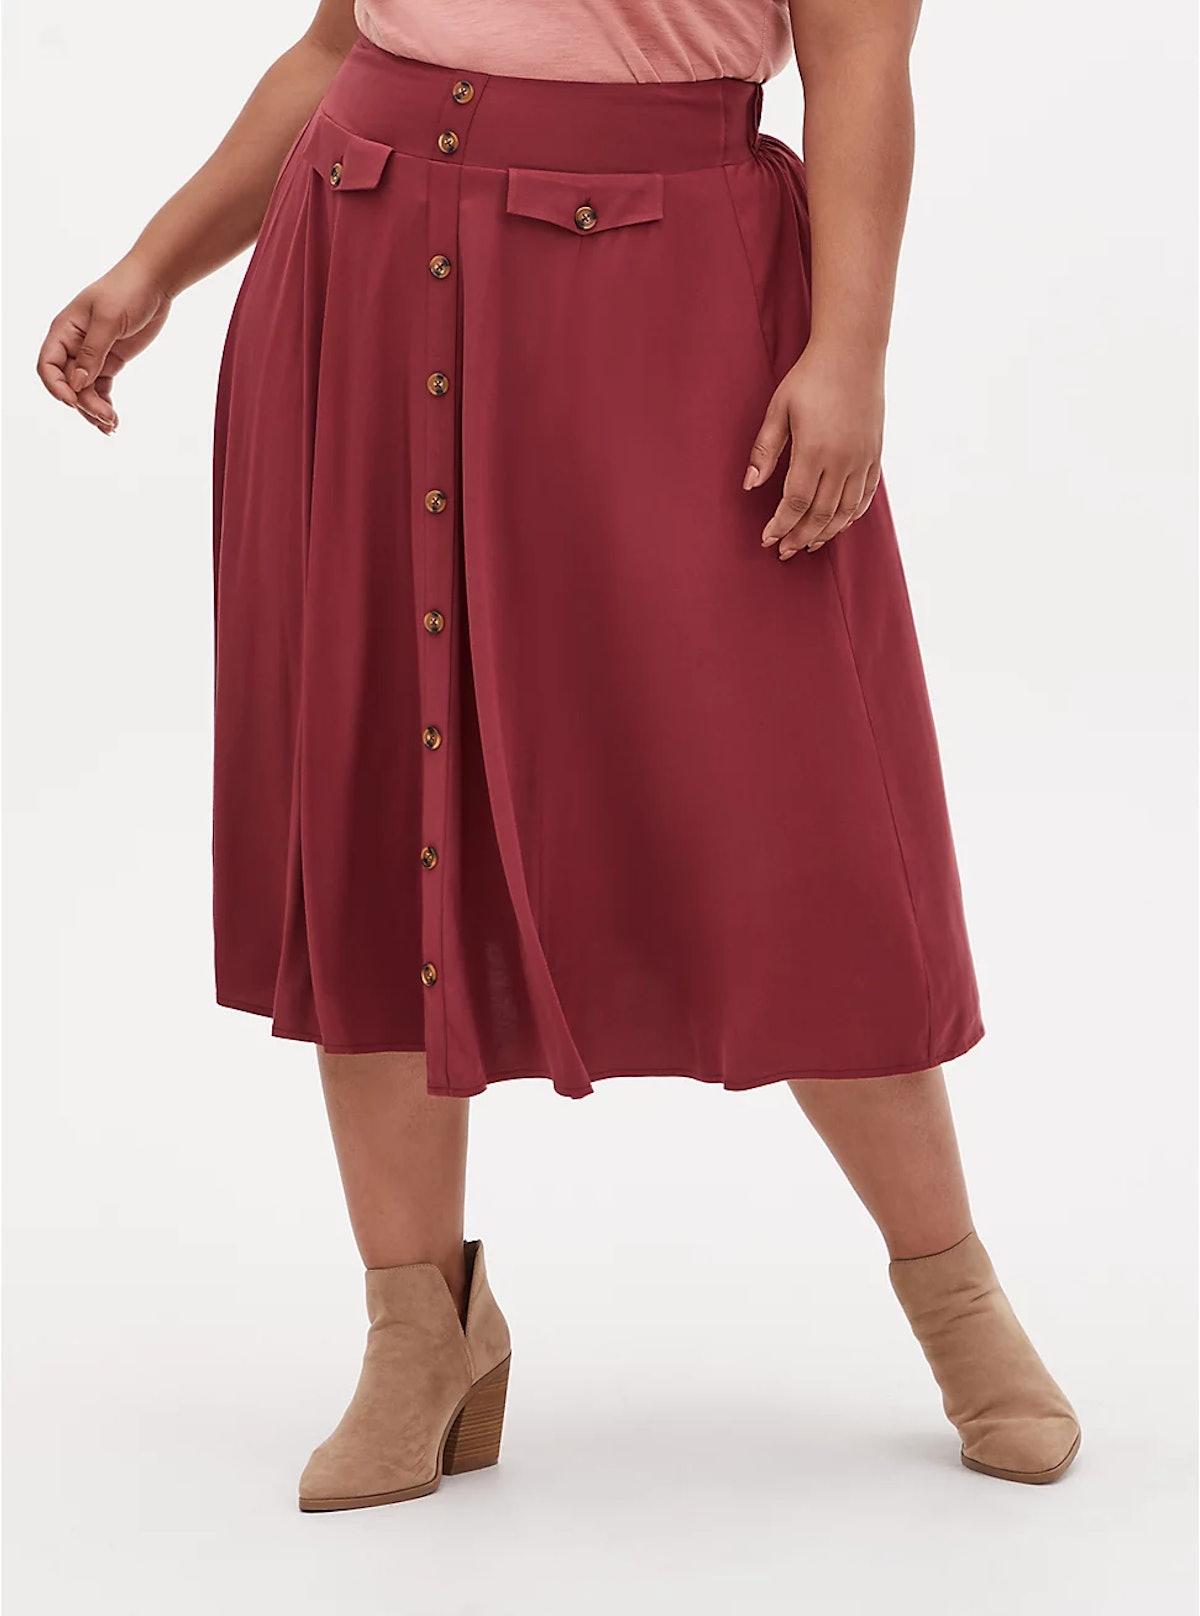 Torrid Dark Red High Waist Button Midi Skirt